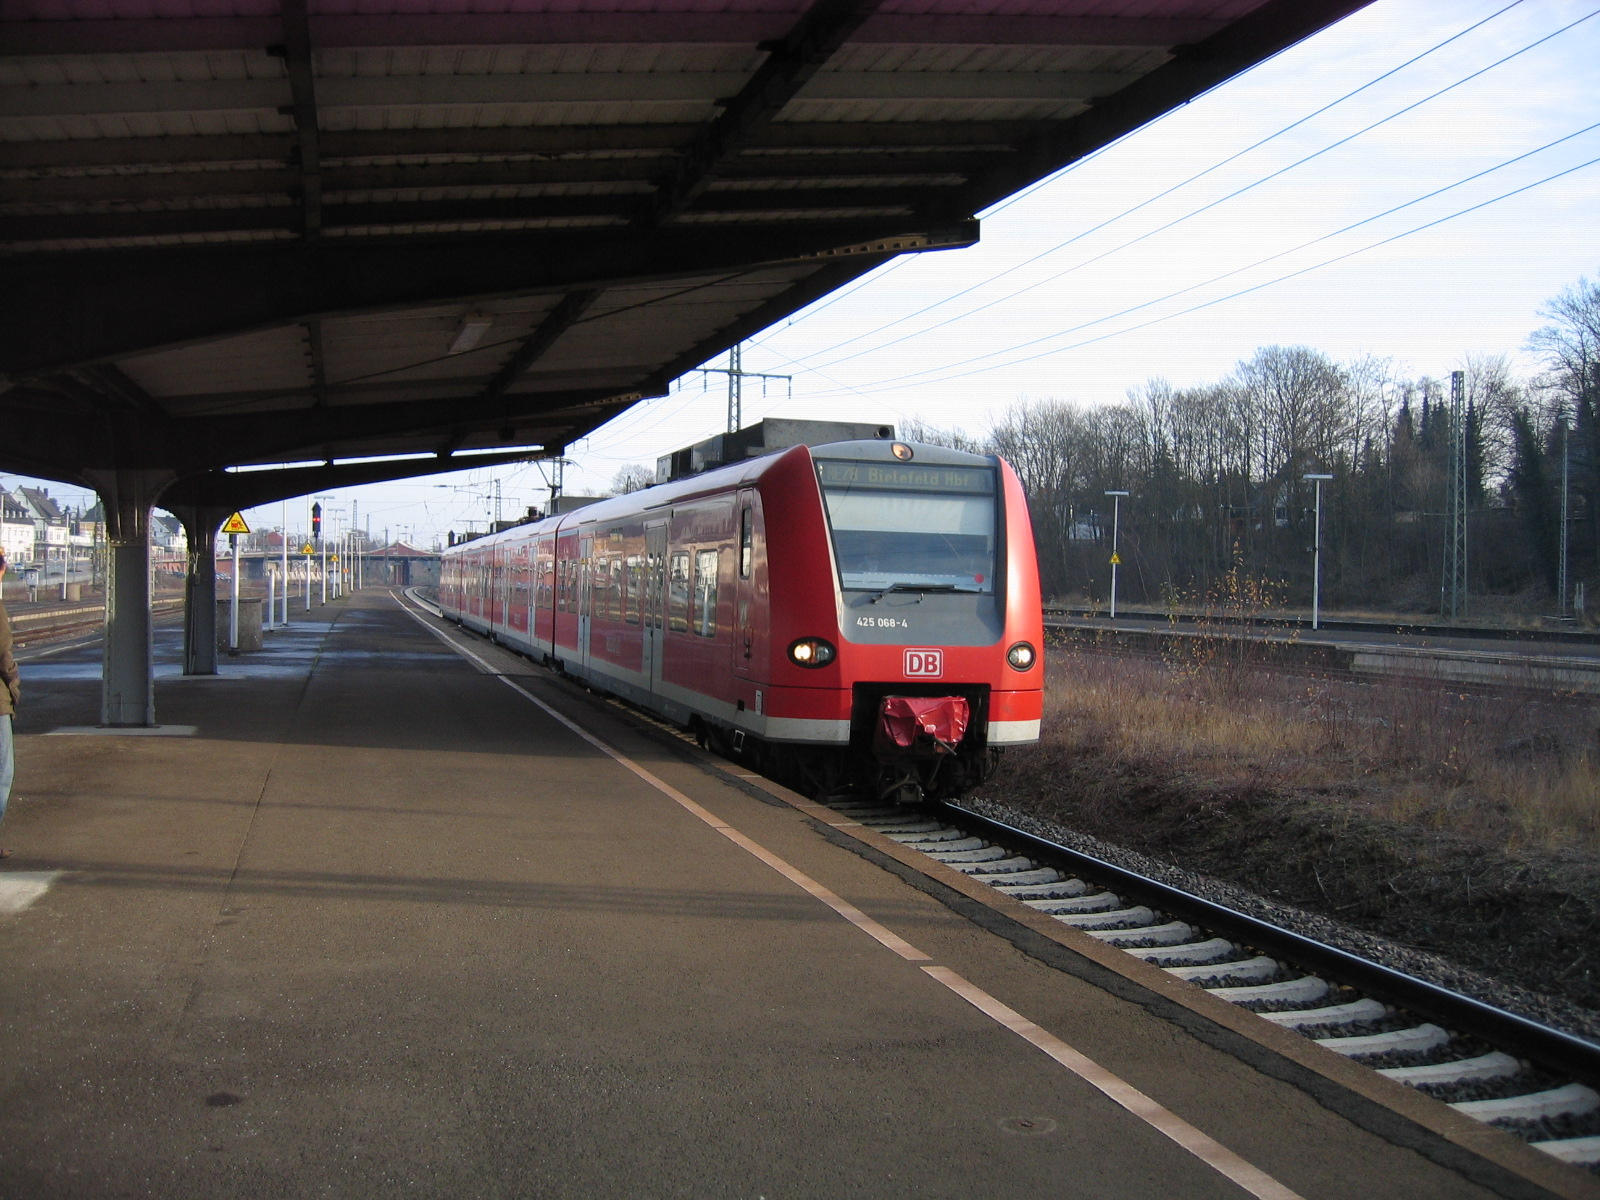 Bahnhof L Hne file löhne bahnhof porta express 2009 12 16 26 jpg wikimedia commons